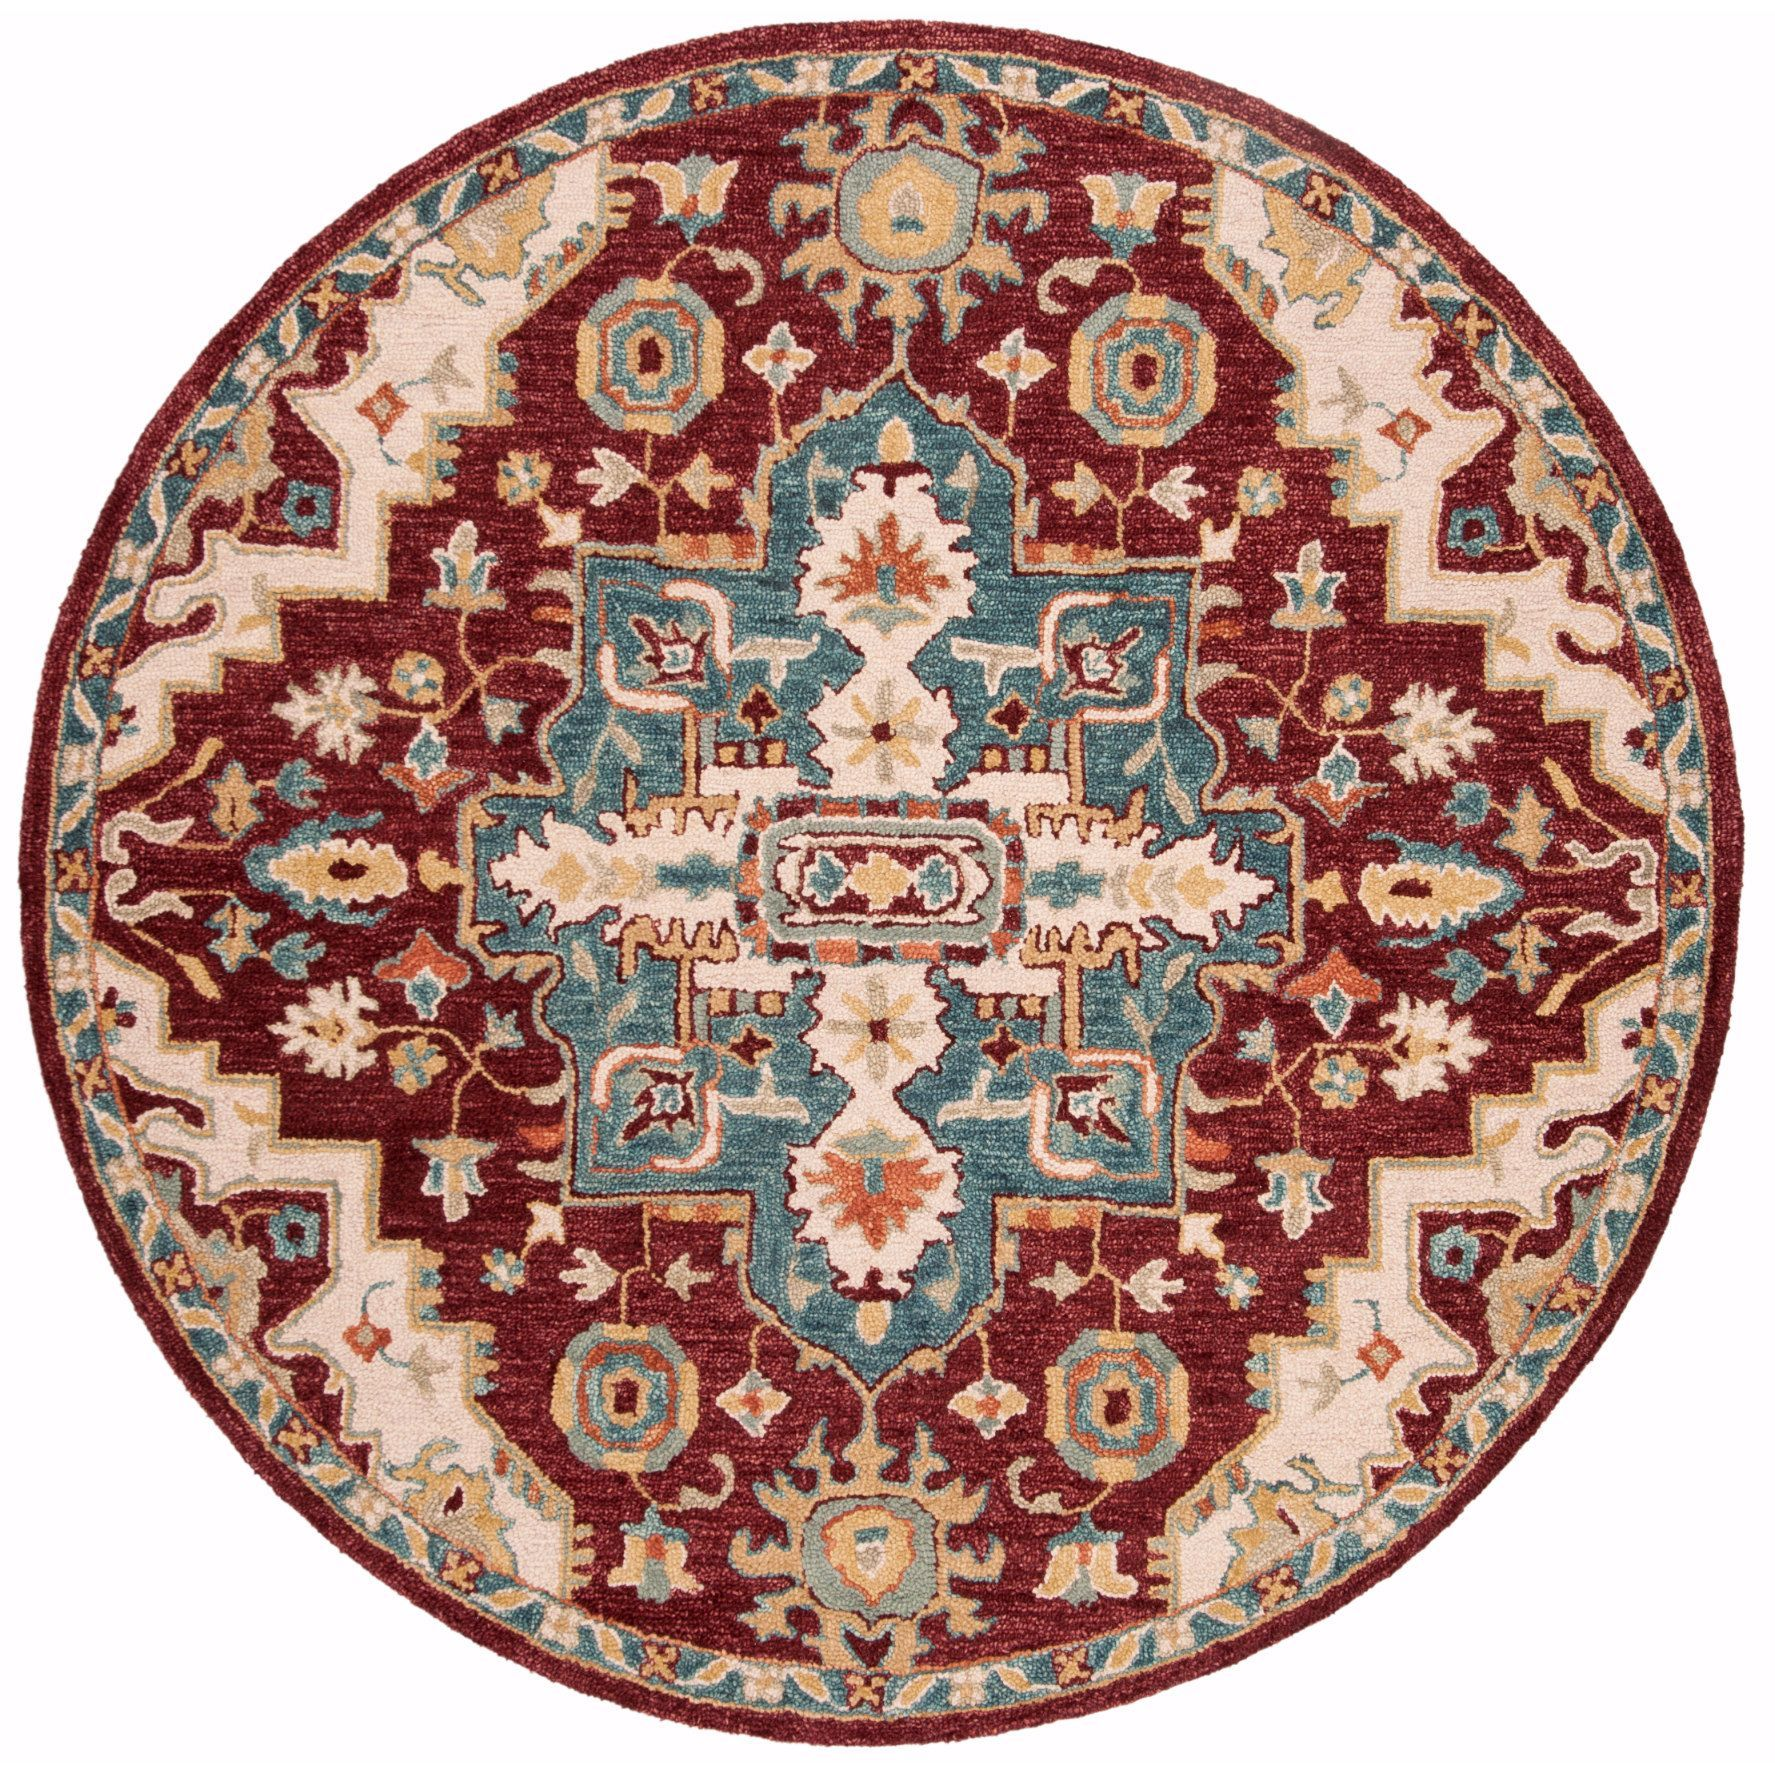 Safavieh Handmade Aspen Rilla Boho Tribal Wool Rug Southwestern